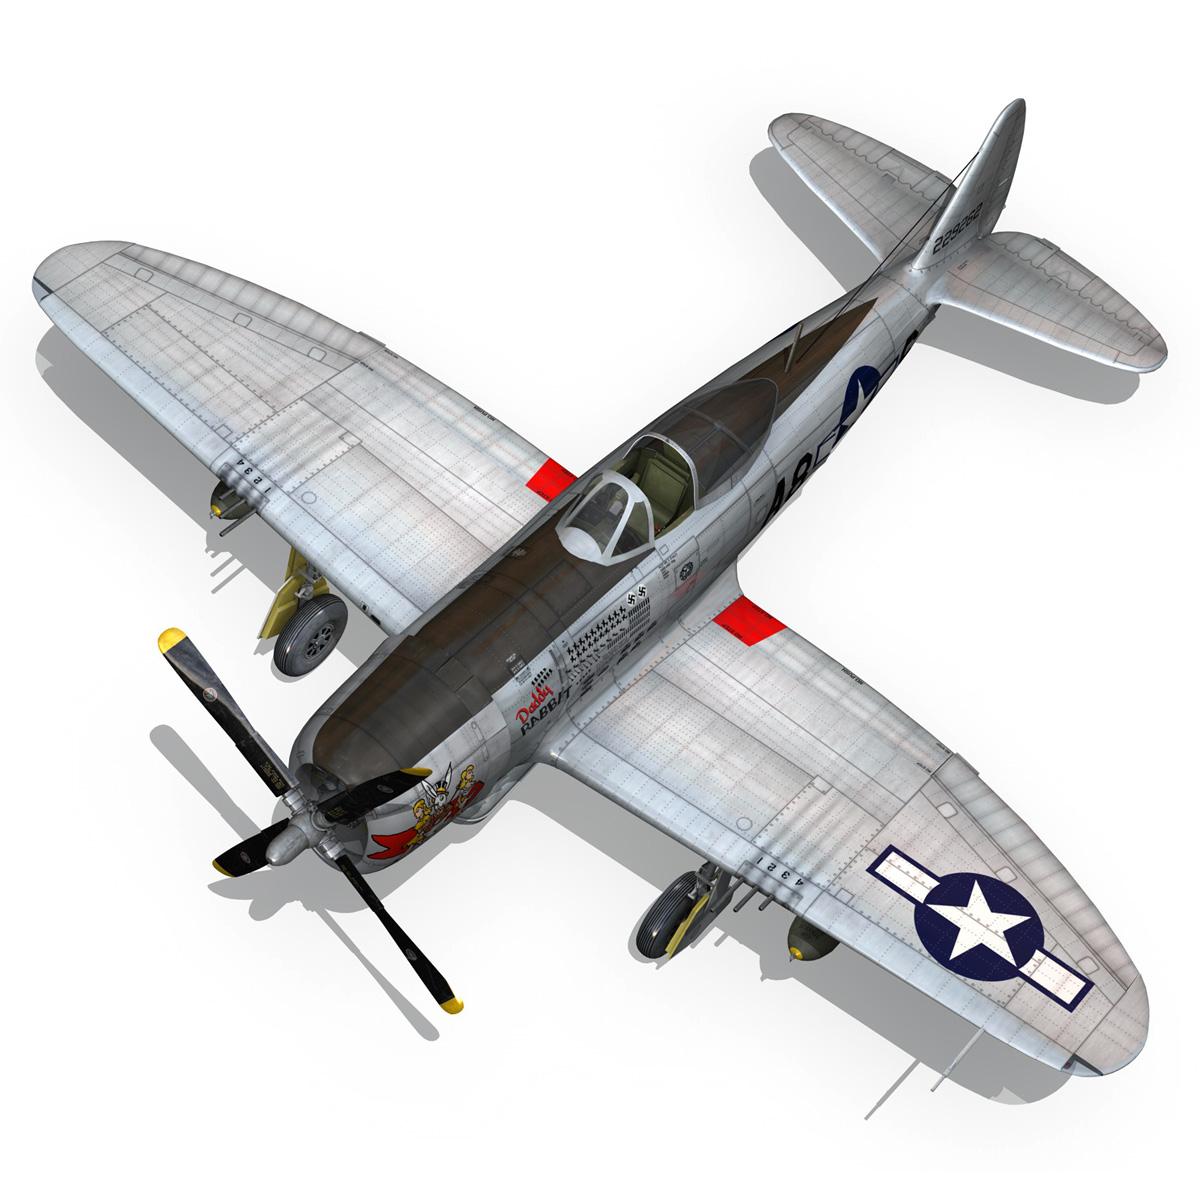 republic p-47 thunderbolt – daddy rabbit 3d model fbx c4d lwo obj 272703